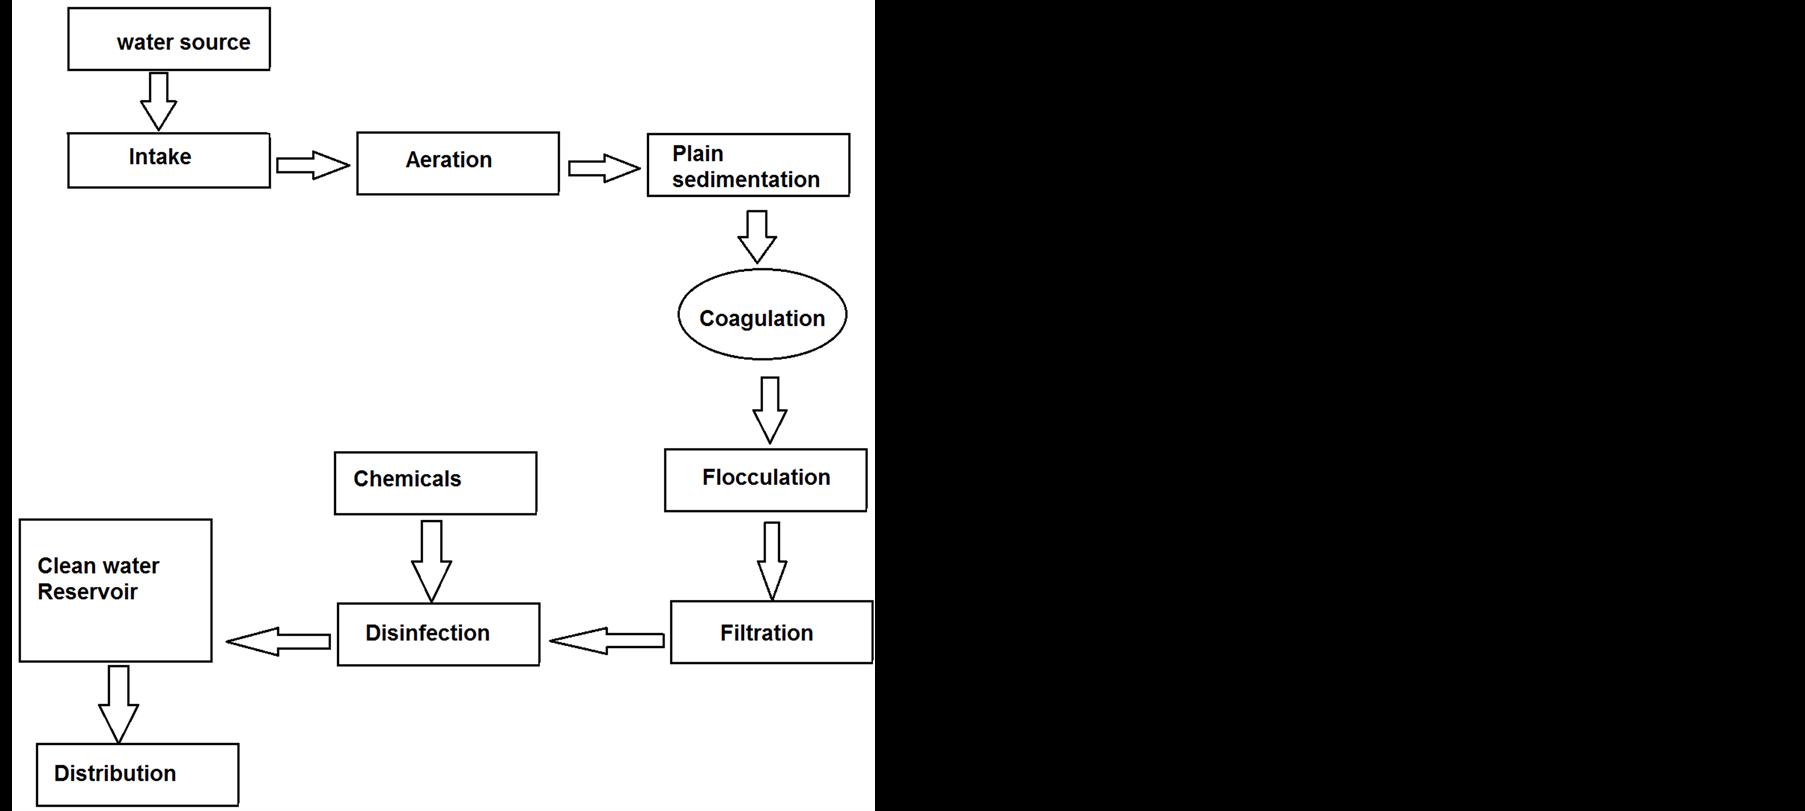 C language programming for development of conventional water flowchart of conventional water treatment plant nvjuhfo Images